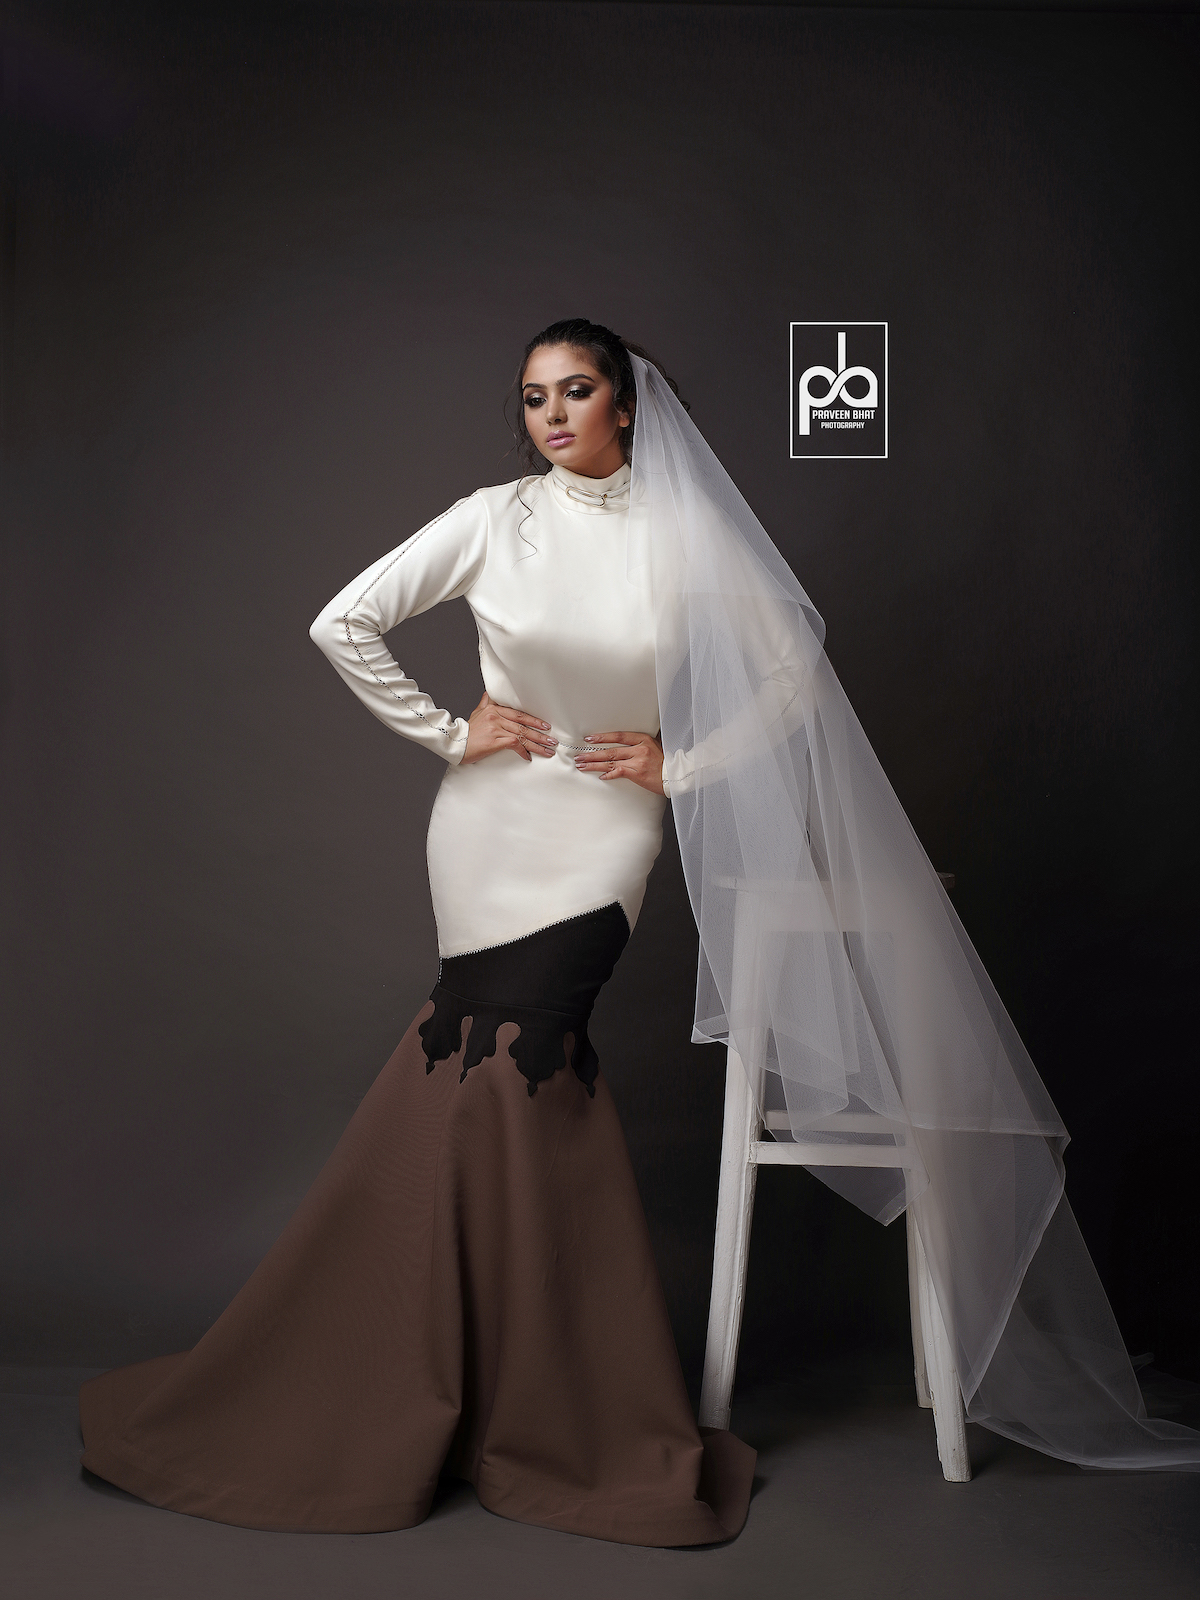 Akshata-Sonawane-hot-photoshoot